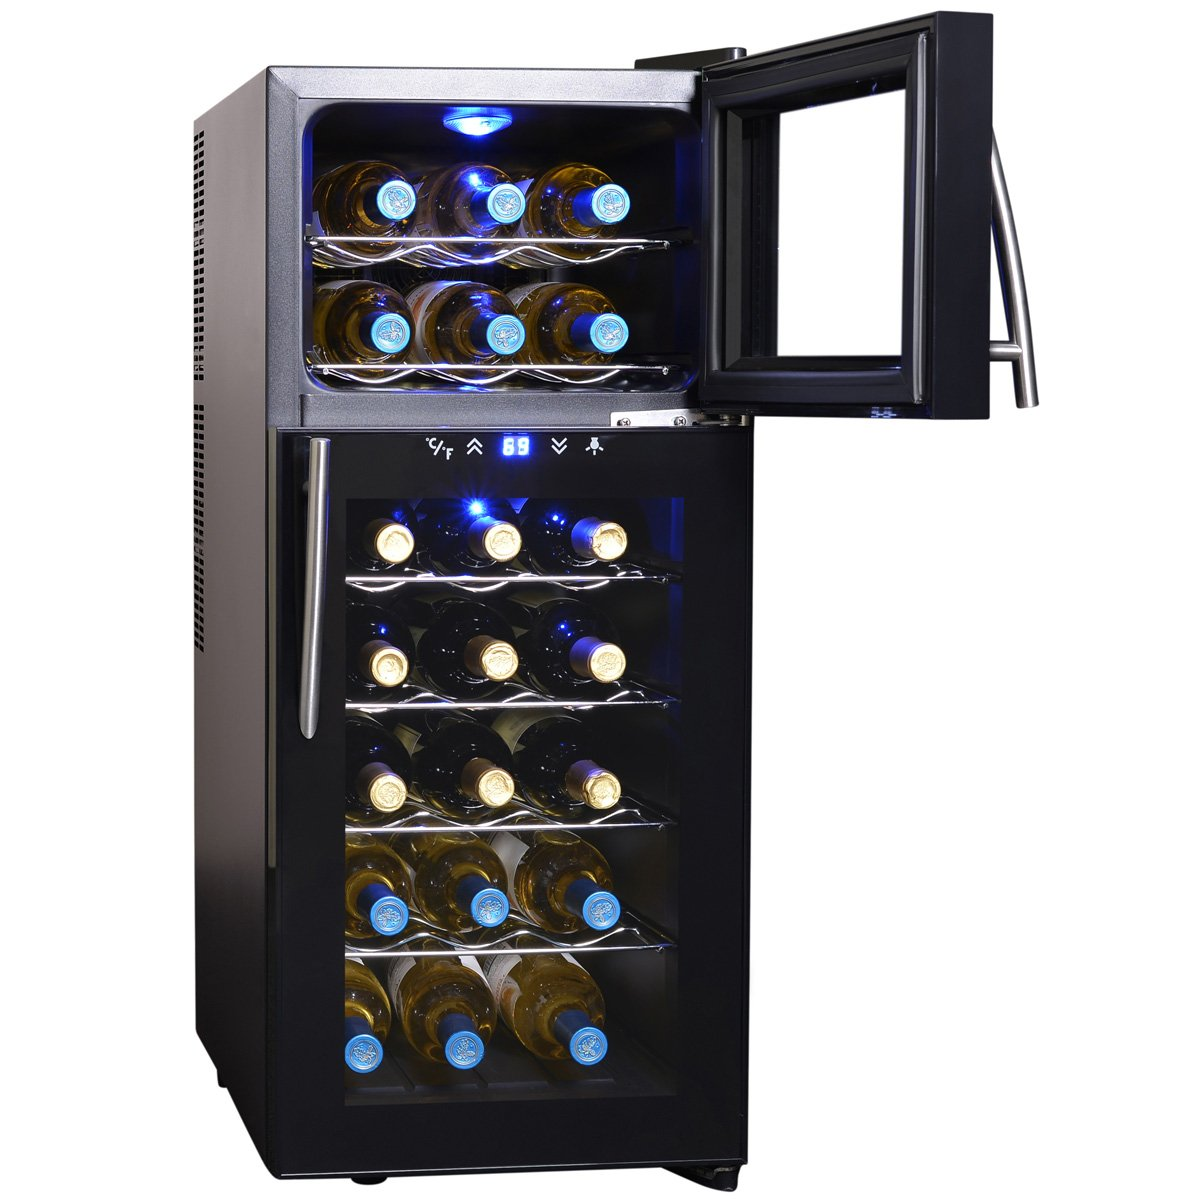 amazoncom newair aw210ed streamline 21 bottle dual zone wine cooler black appliances